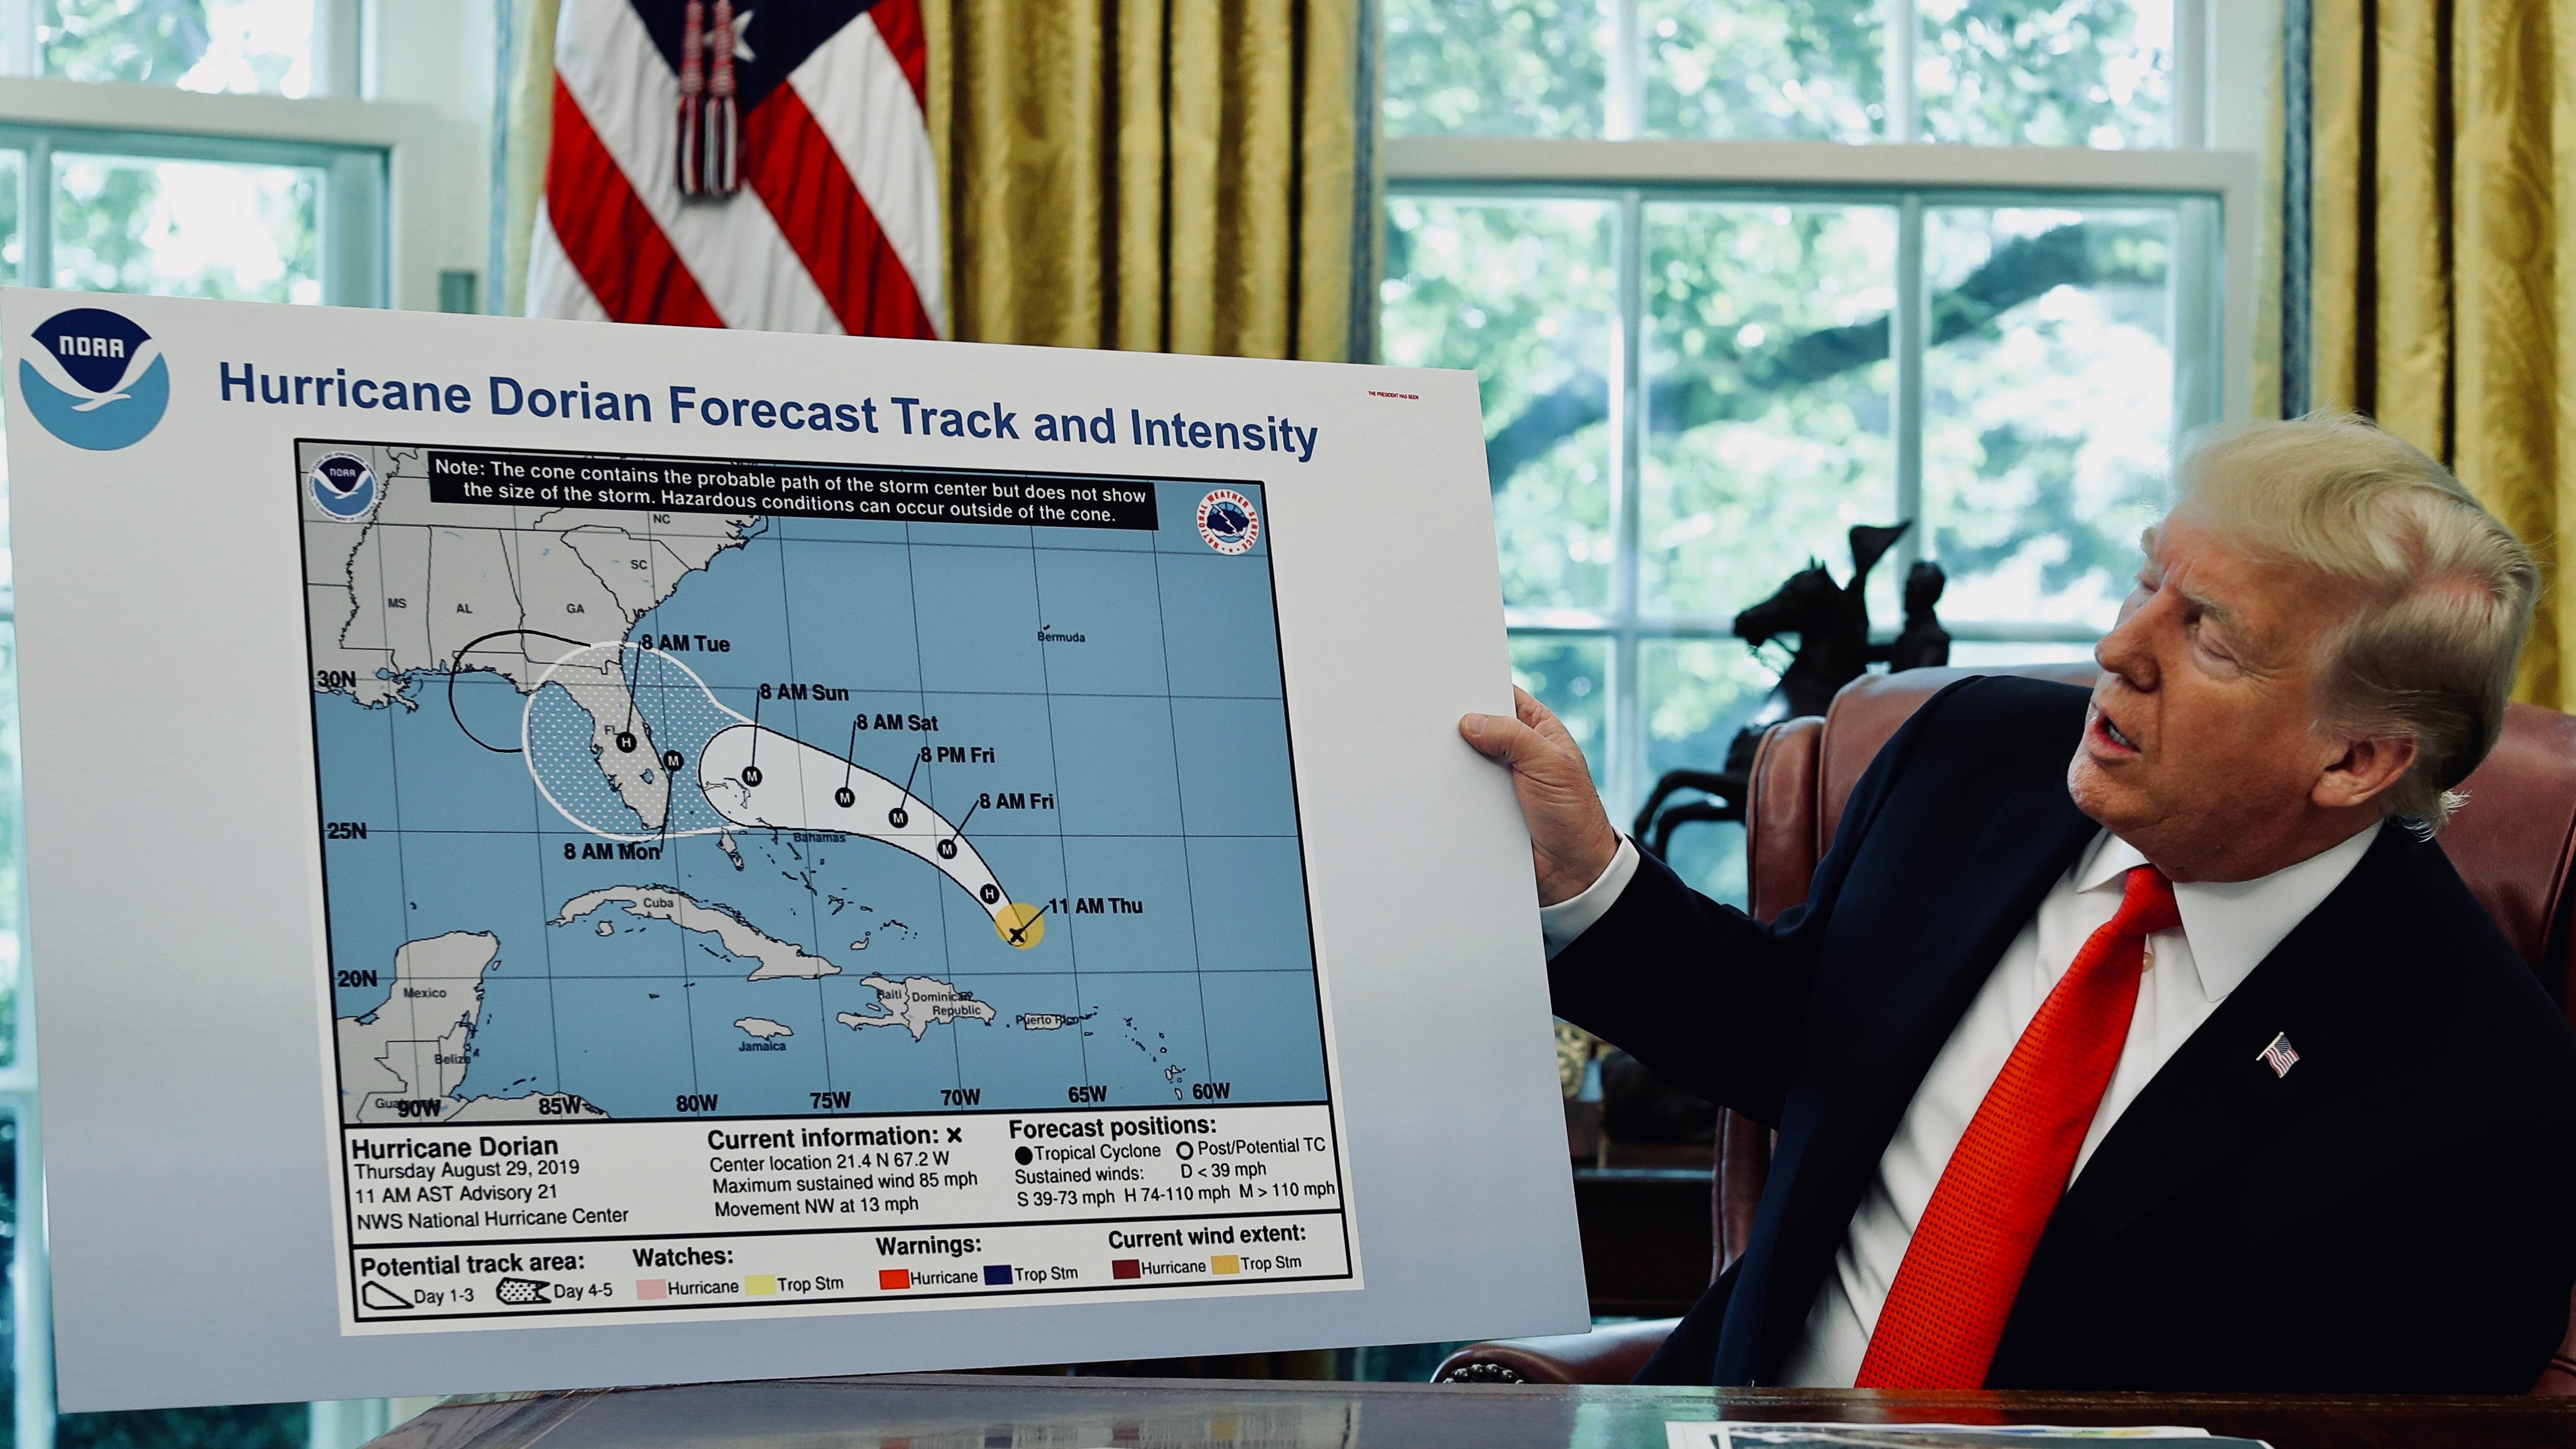 U.S. President Trump receives a Hurricane Dorian update at the White House in Washington.